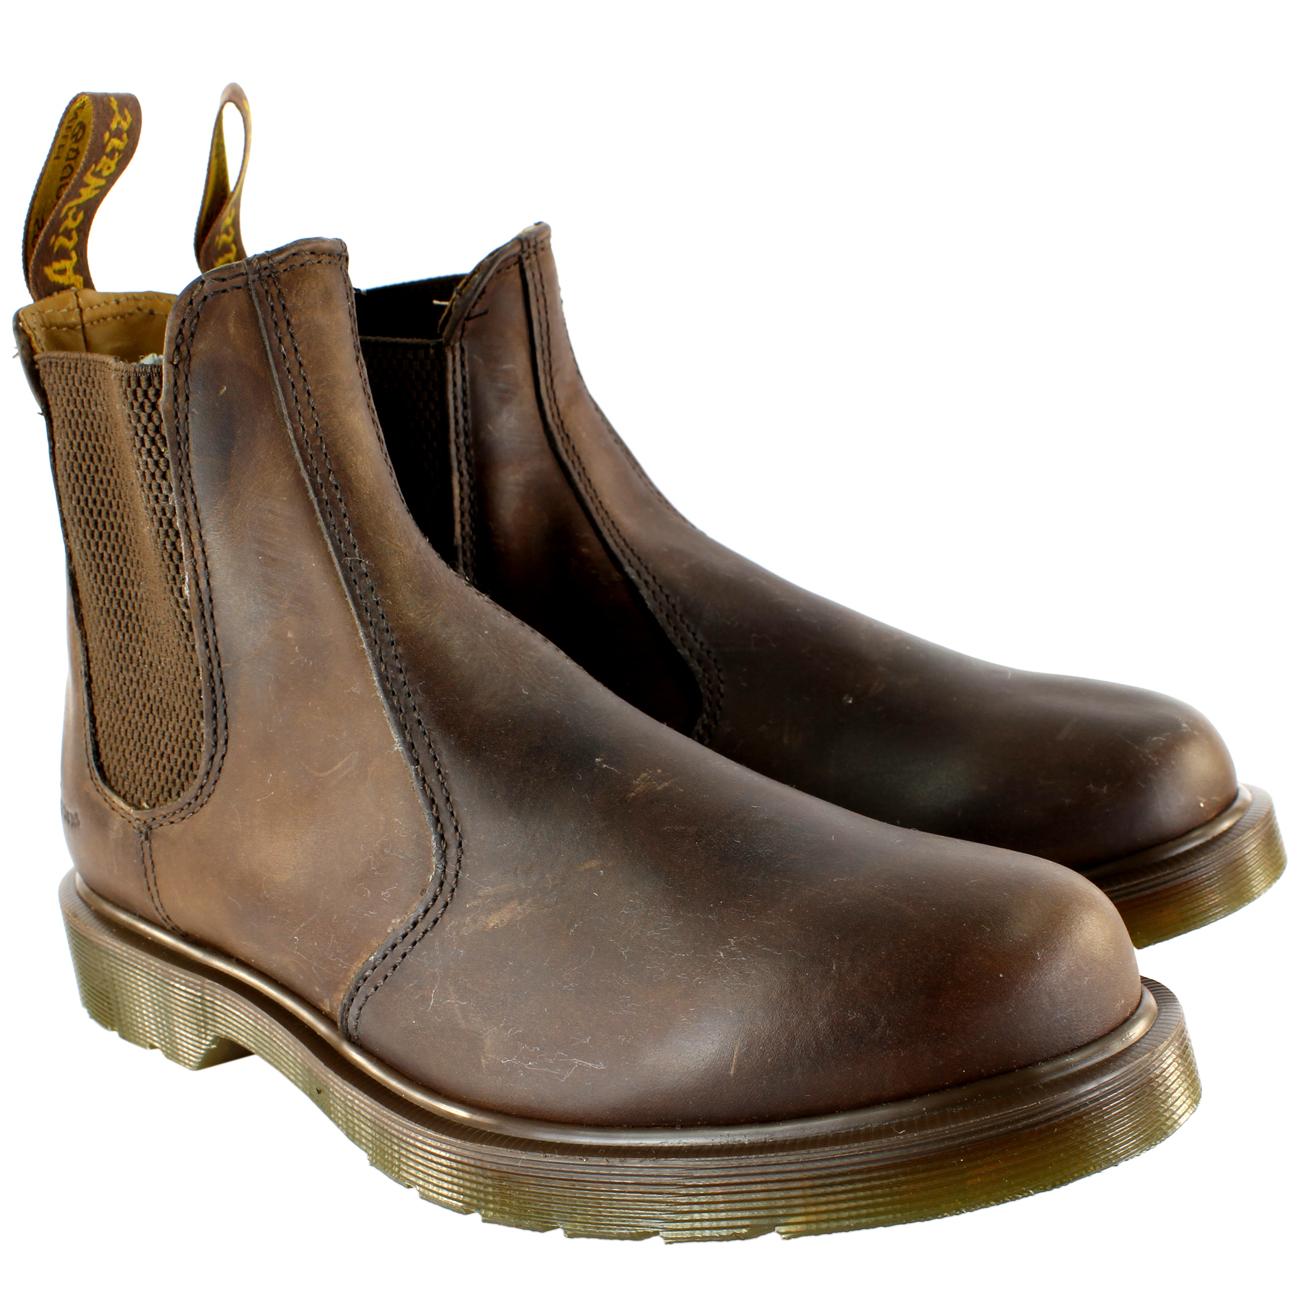 Damen Schuhe Dr Martens Airwair Leder Chelsea Stil Knöchel Stiefel ... d18b6572497c